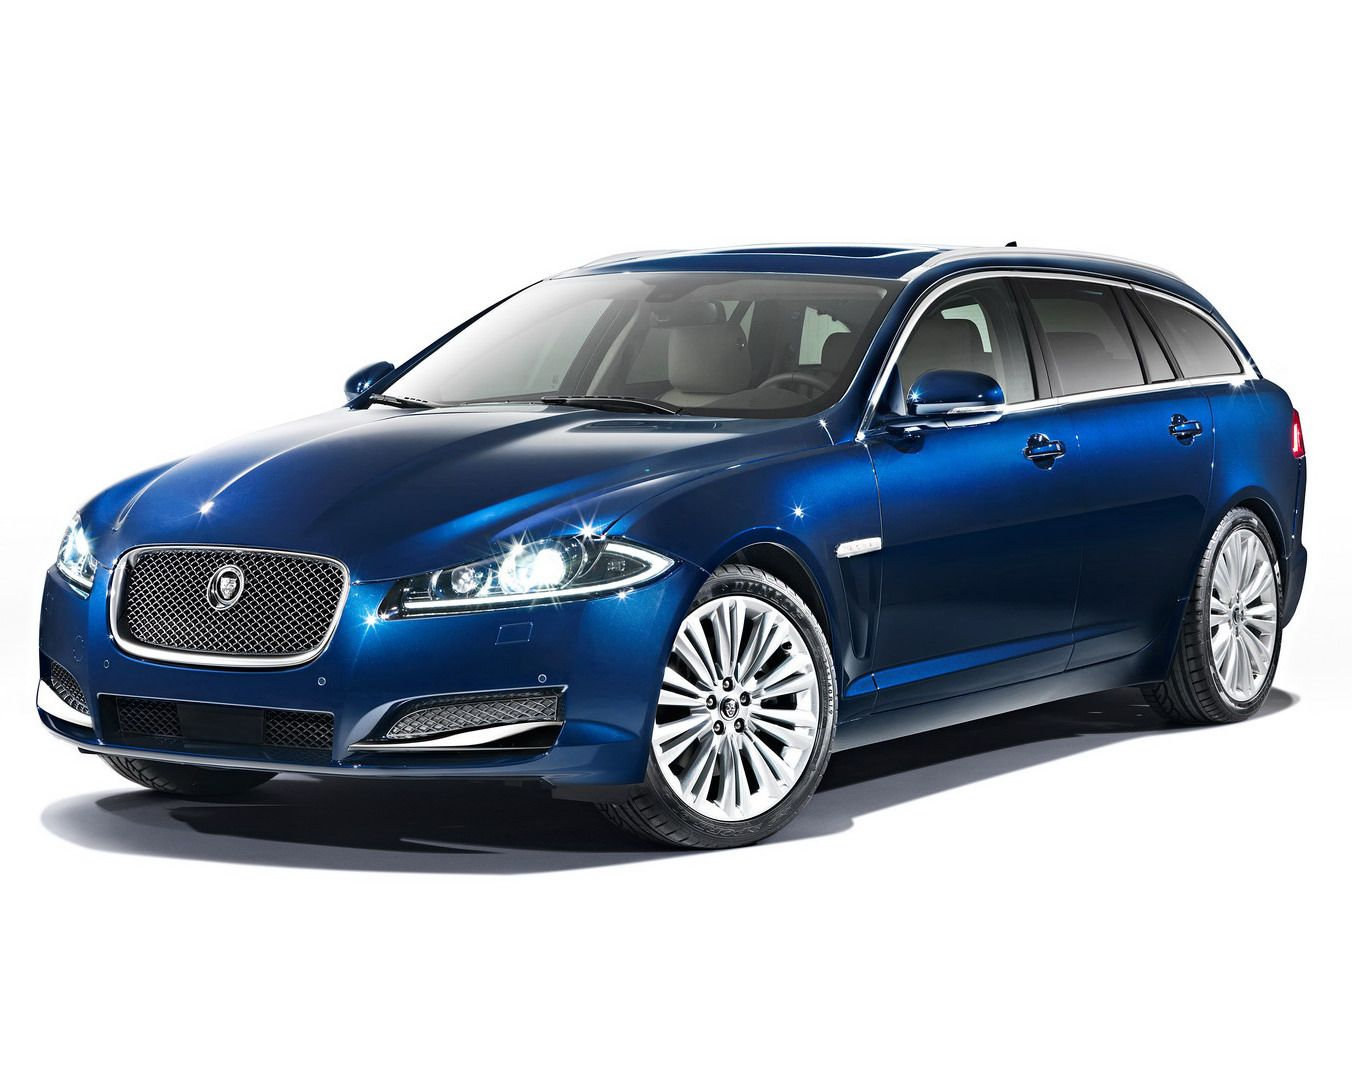 jaguar cars images - Bing Images | Eee Jags! | Pinterest | Car ...